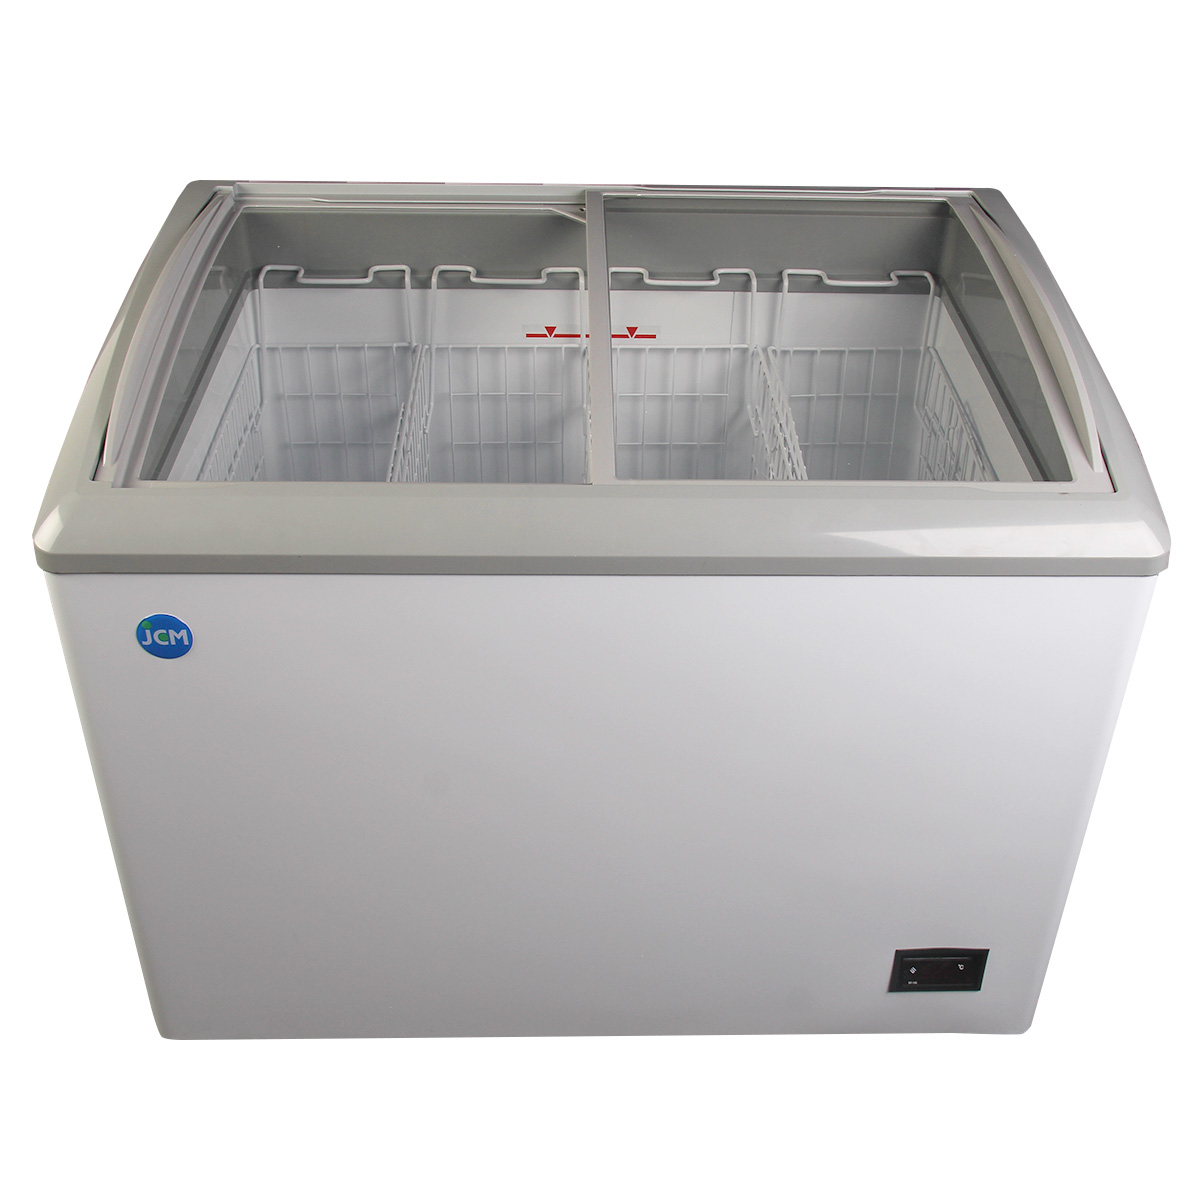 JCM 冷凍ショーケース JCMCS-180 業務用 冷凍 冷凍庫 保冷庫 ショーケース スライド 【代引不可】